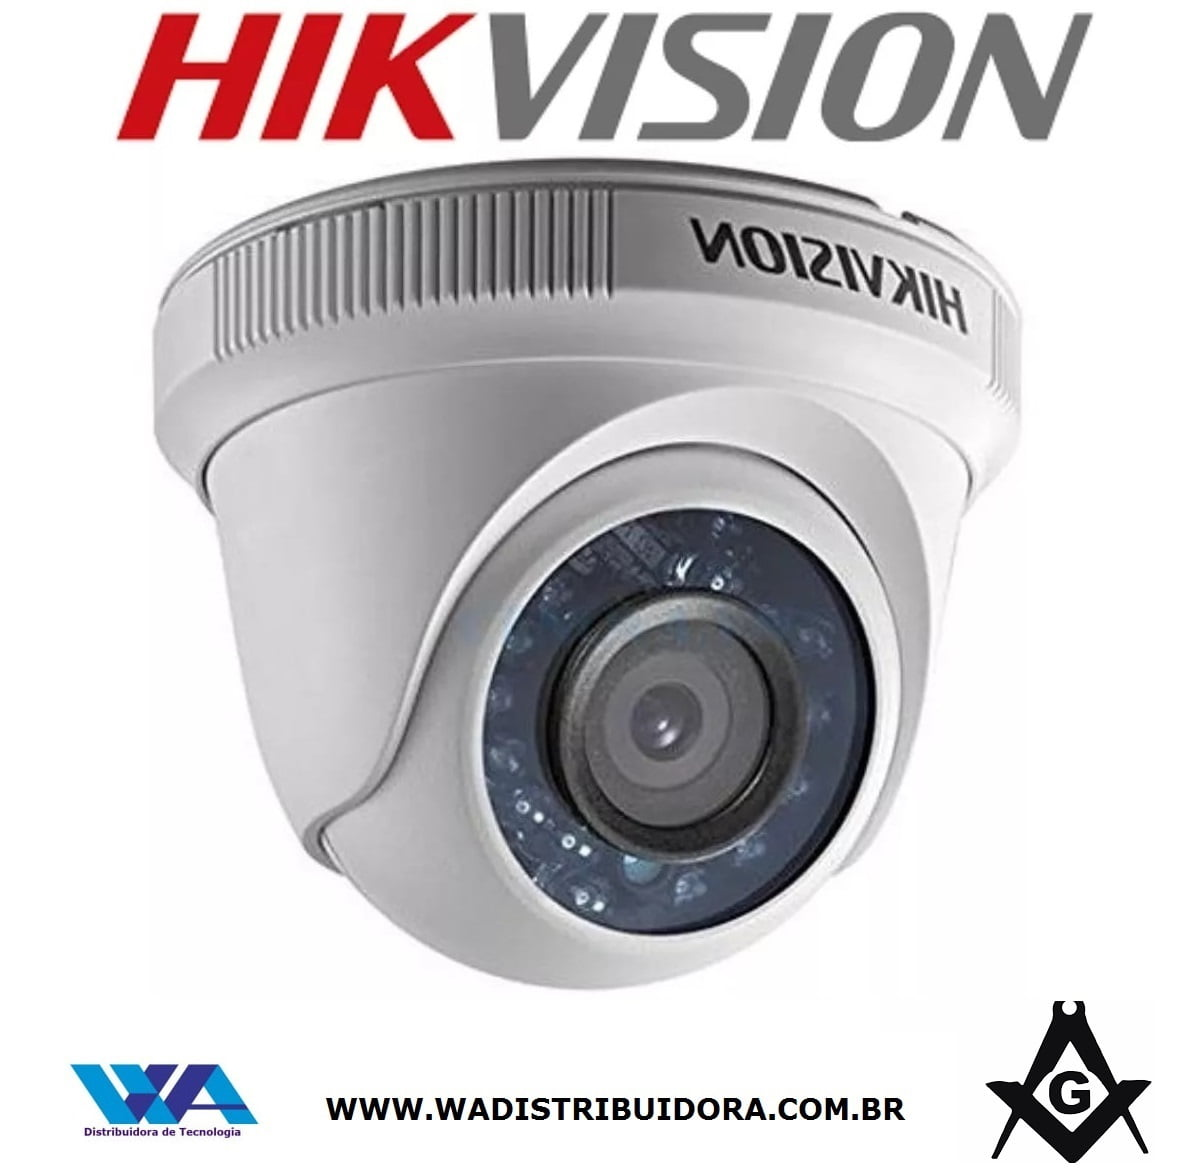 Câmera de segurança dome infra 15mts full hd 1080P Lente 2,8mm icr smartr Hikvision Ds-2ce5ad0t-irp